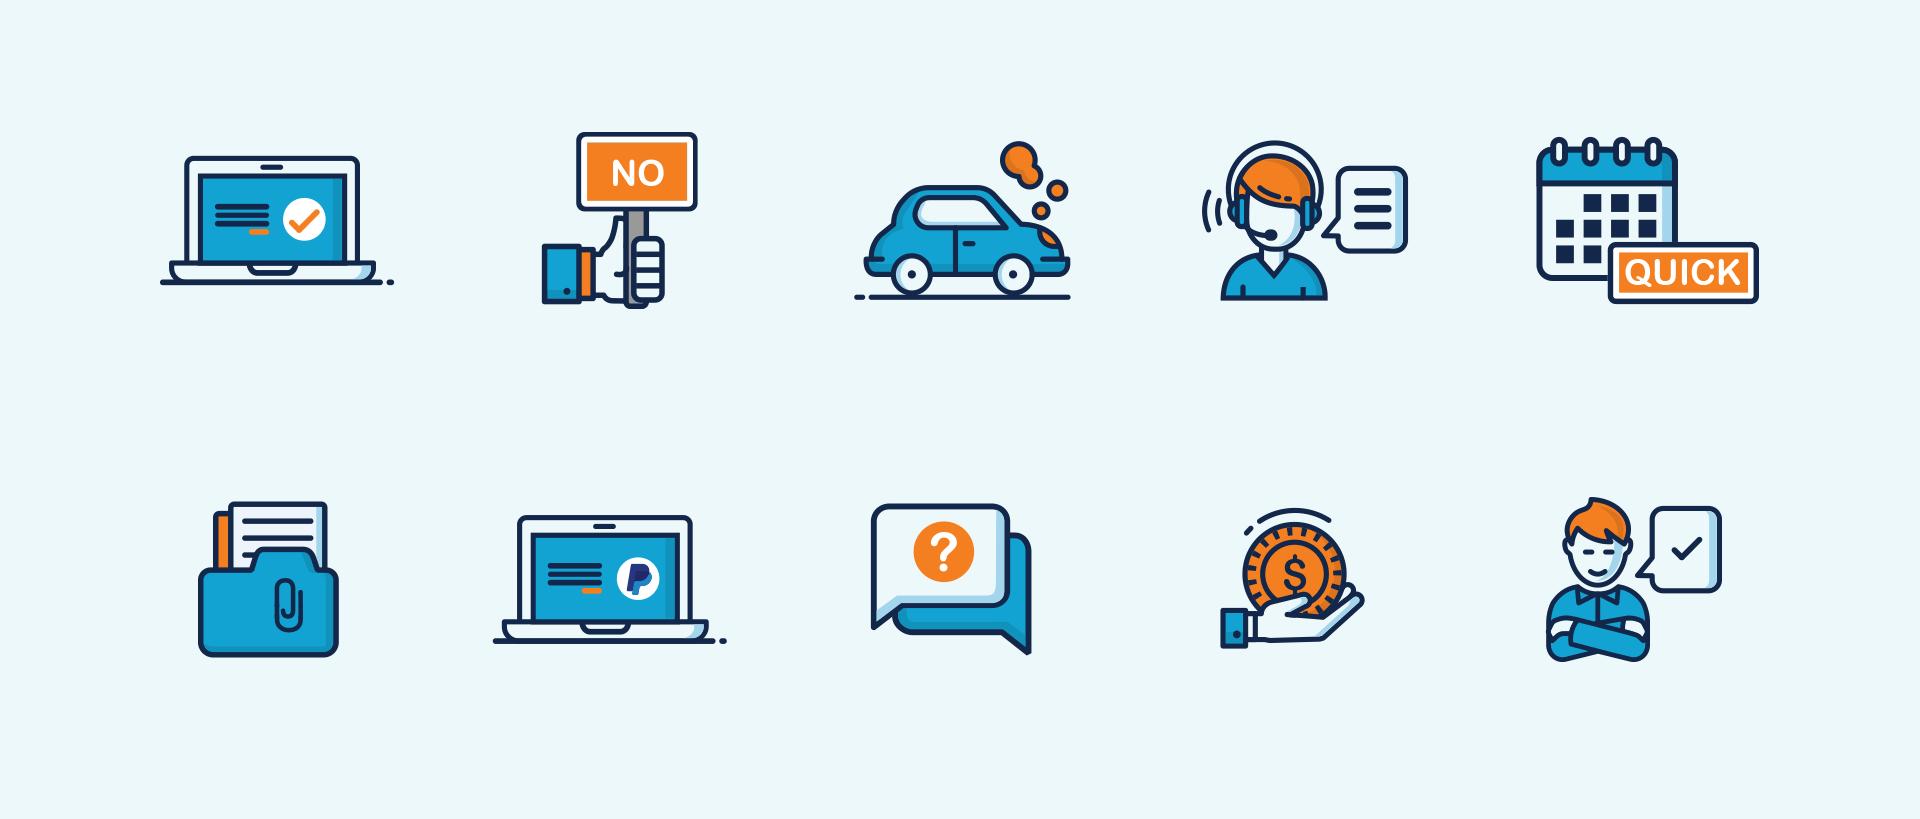 Icon graphic design Sydney